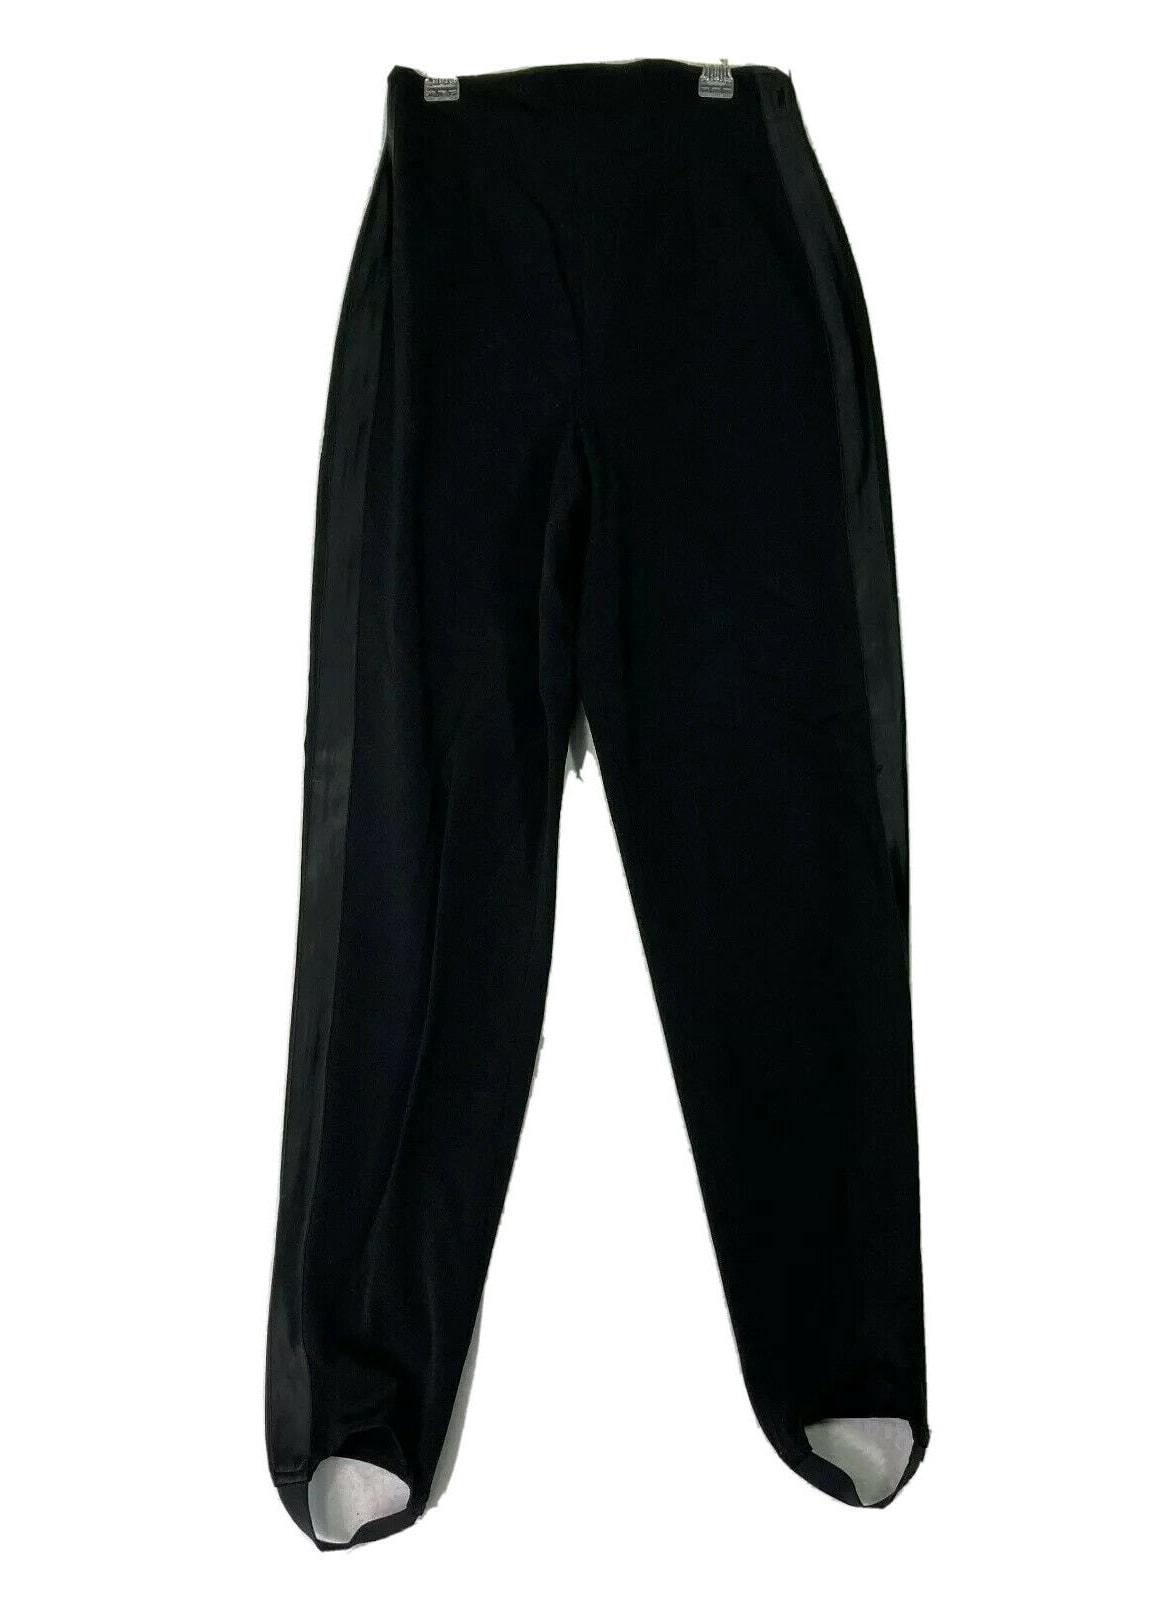 VTG 80s DKNY Tuxedo stirrup Trousers Archive Rare Black Size 10 27x29 High Rise